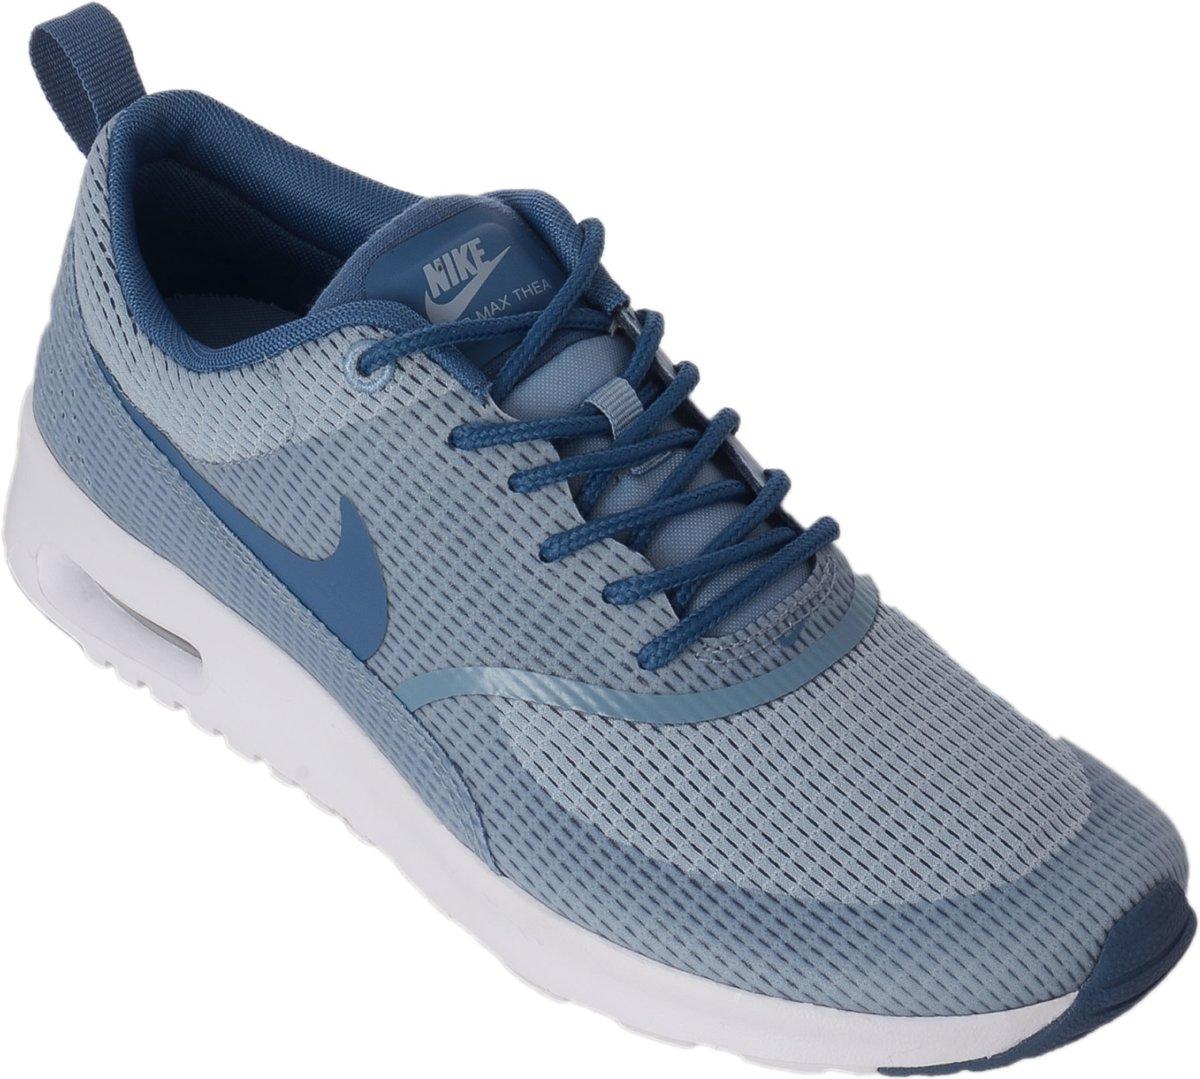 Nike Air Max Thea Mid W schoenen bruin